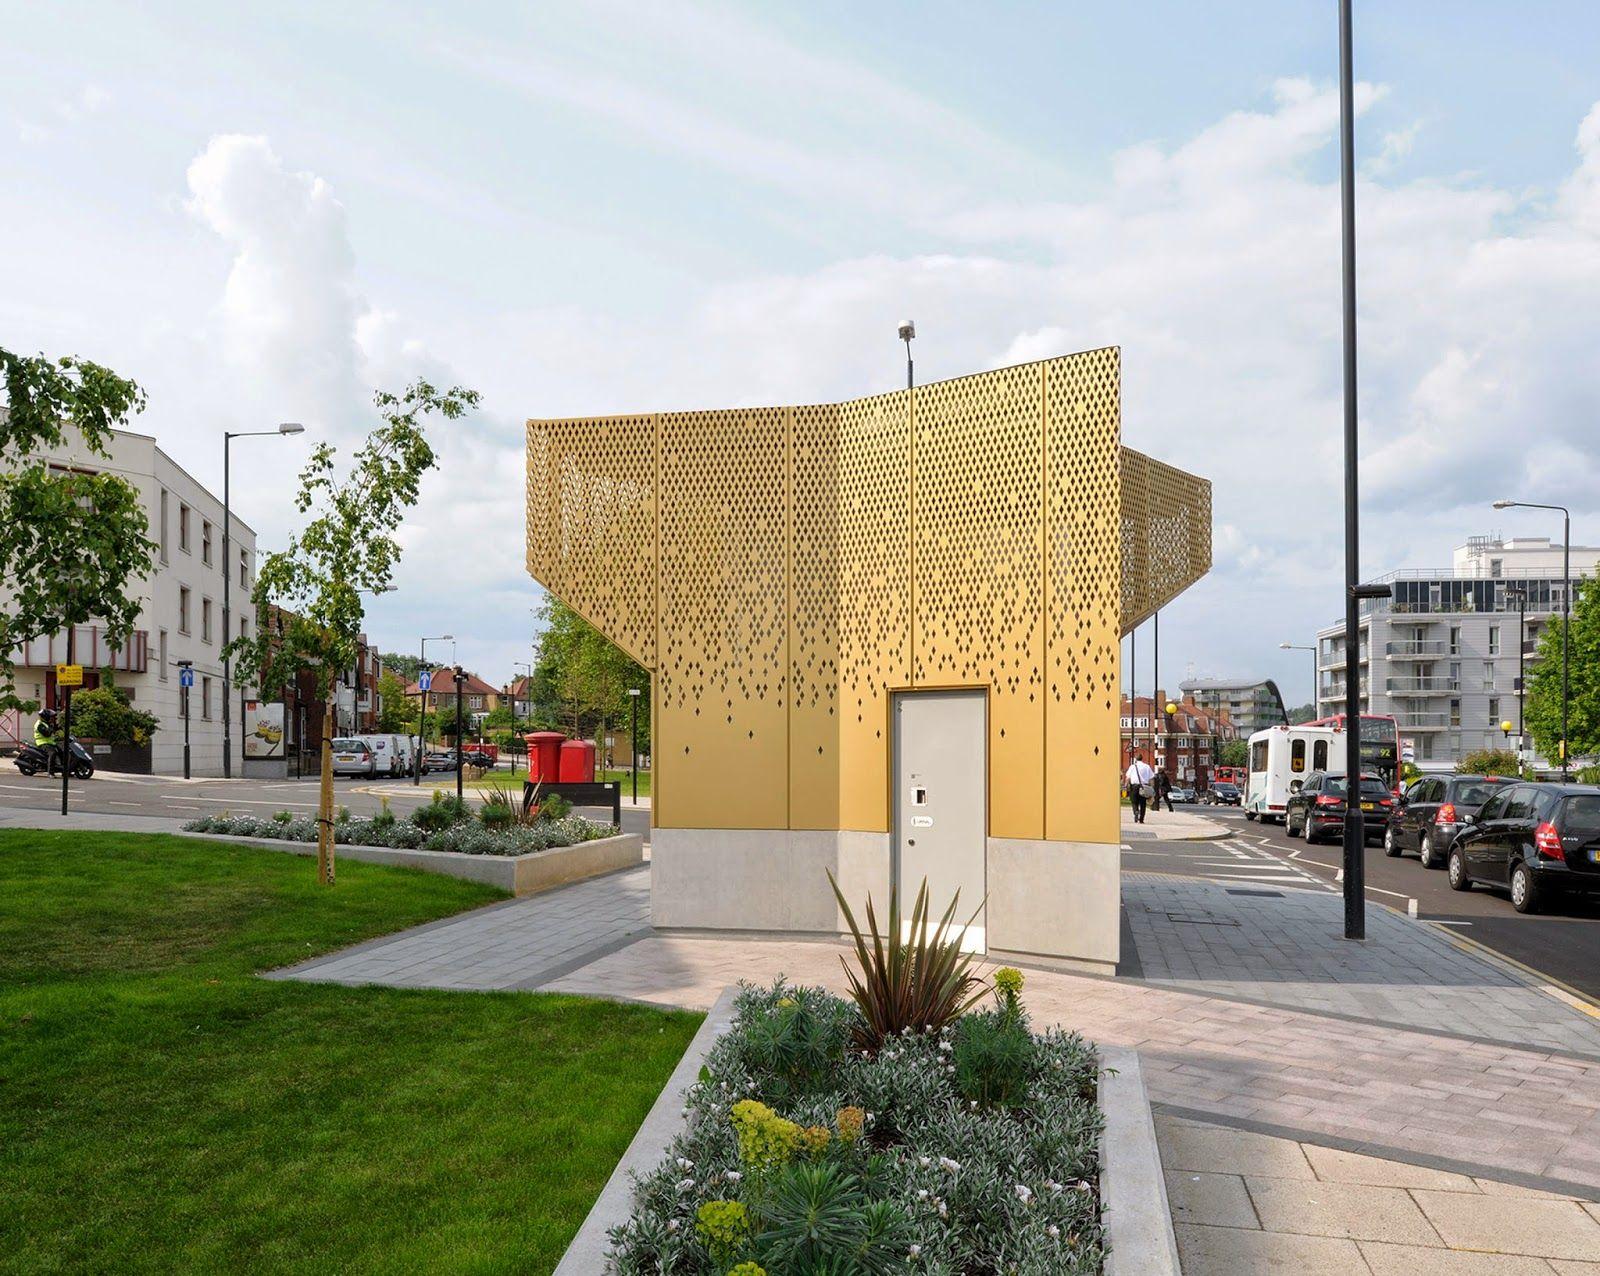 Archetcetera Public Toilets By Gort Scott Architects